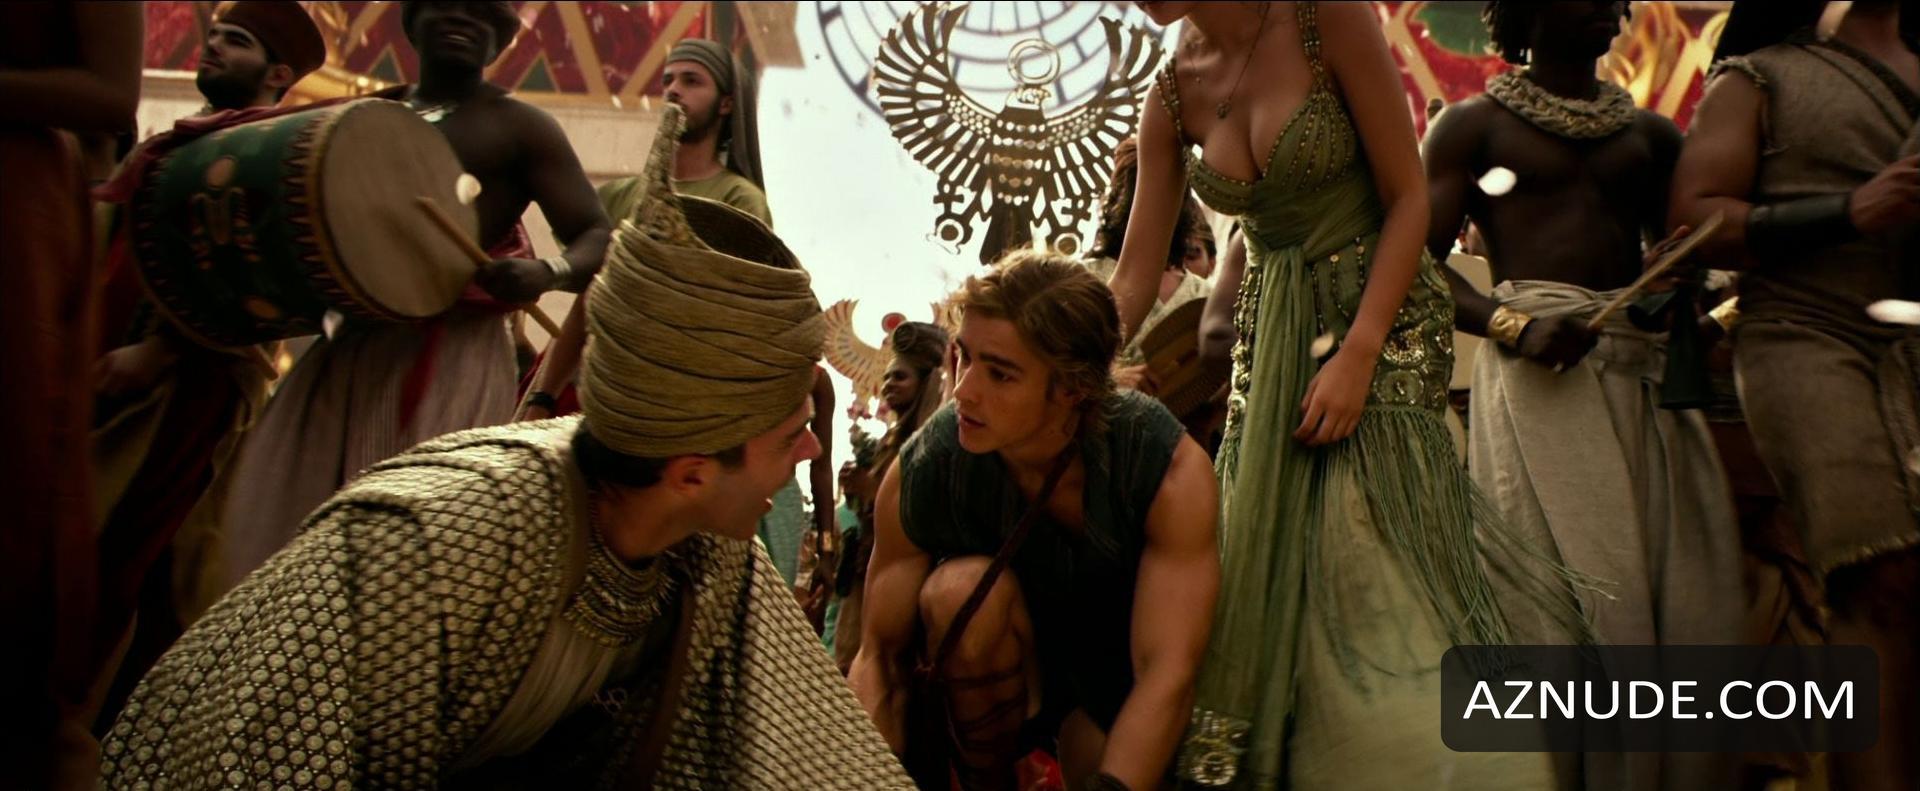 Gods Of Egypt Nude Scenes - Aznude-1318